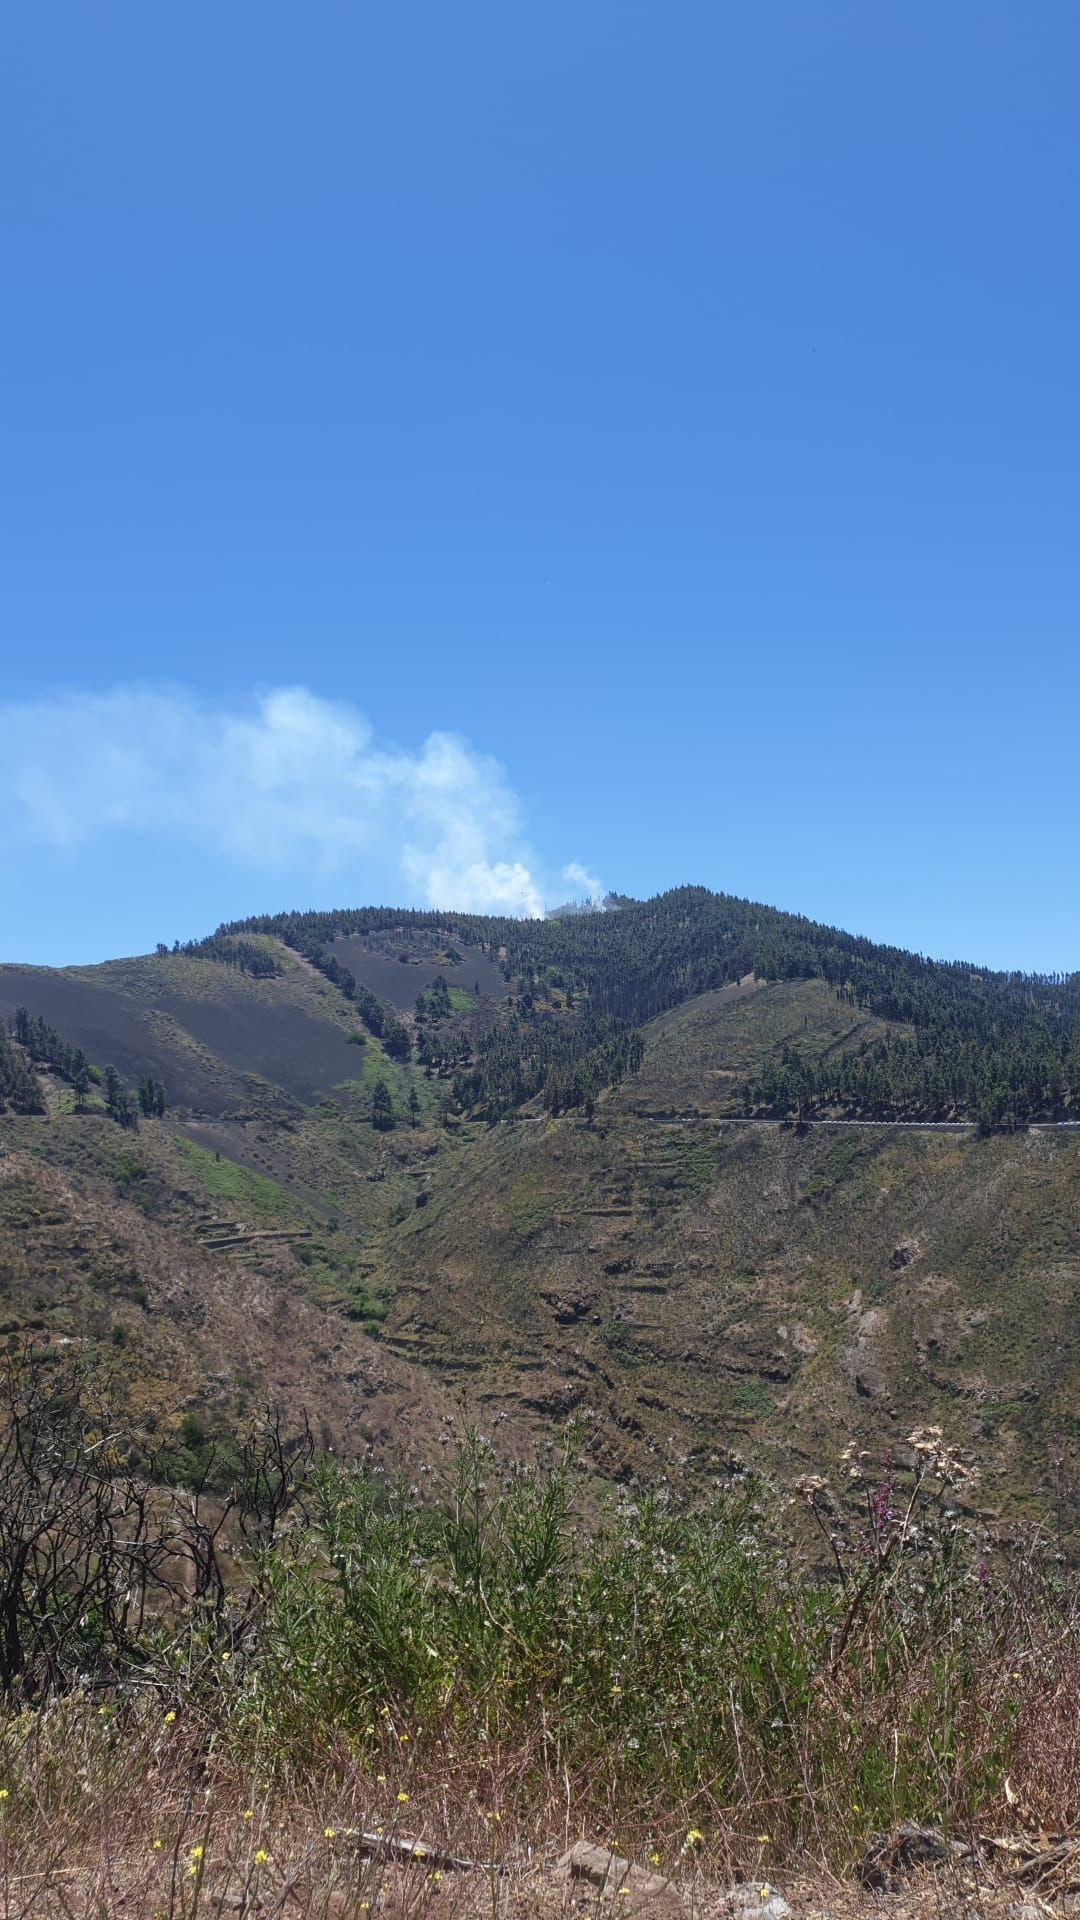 Quemas prescritas en la cumbre de Gran Canaria (30/05/21)